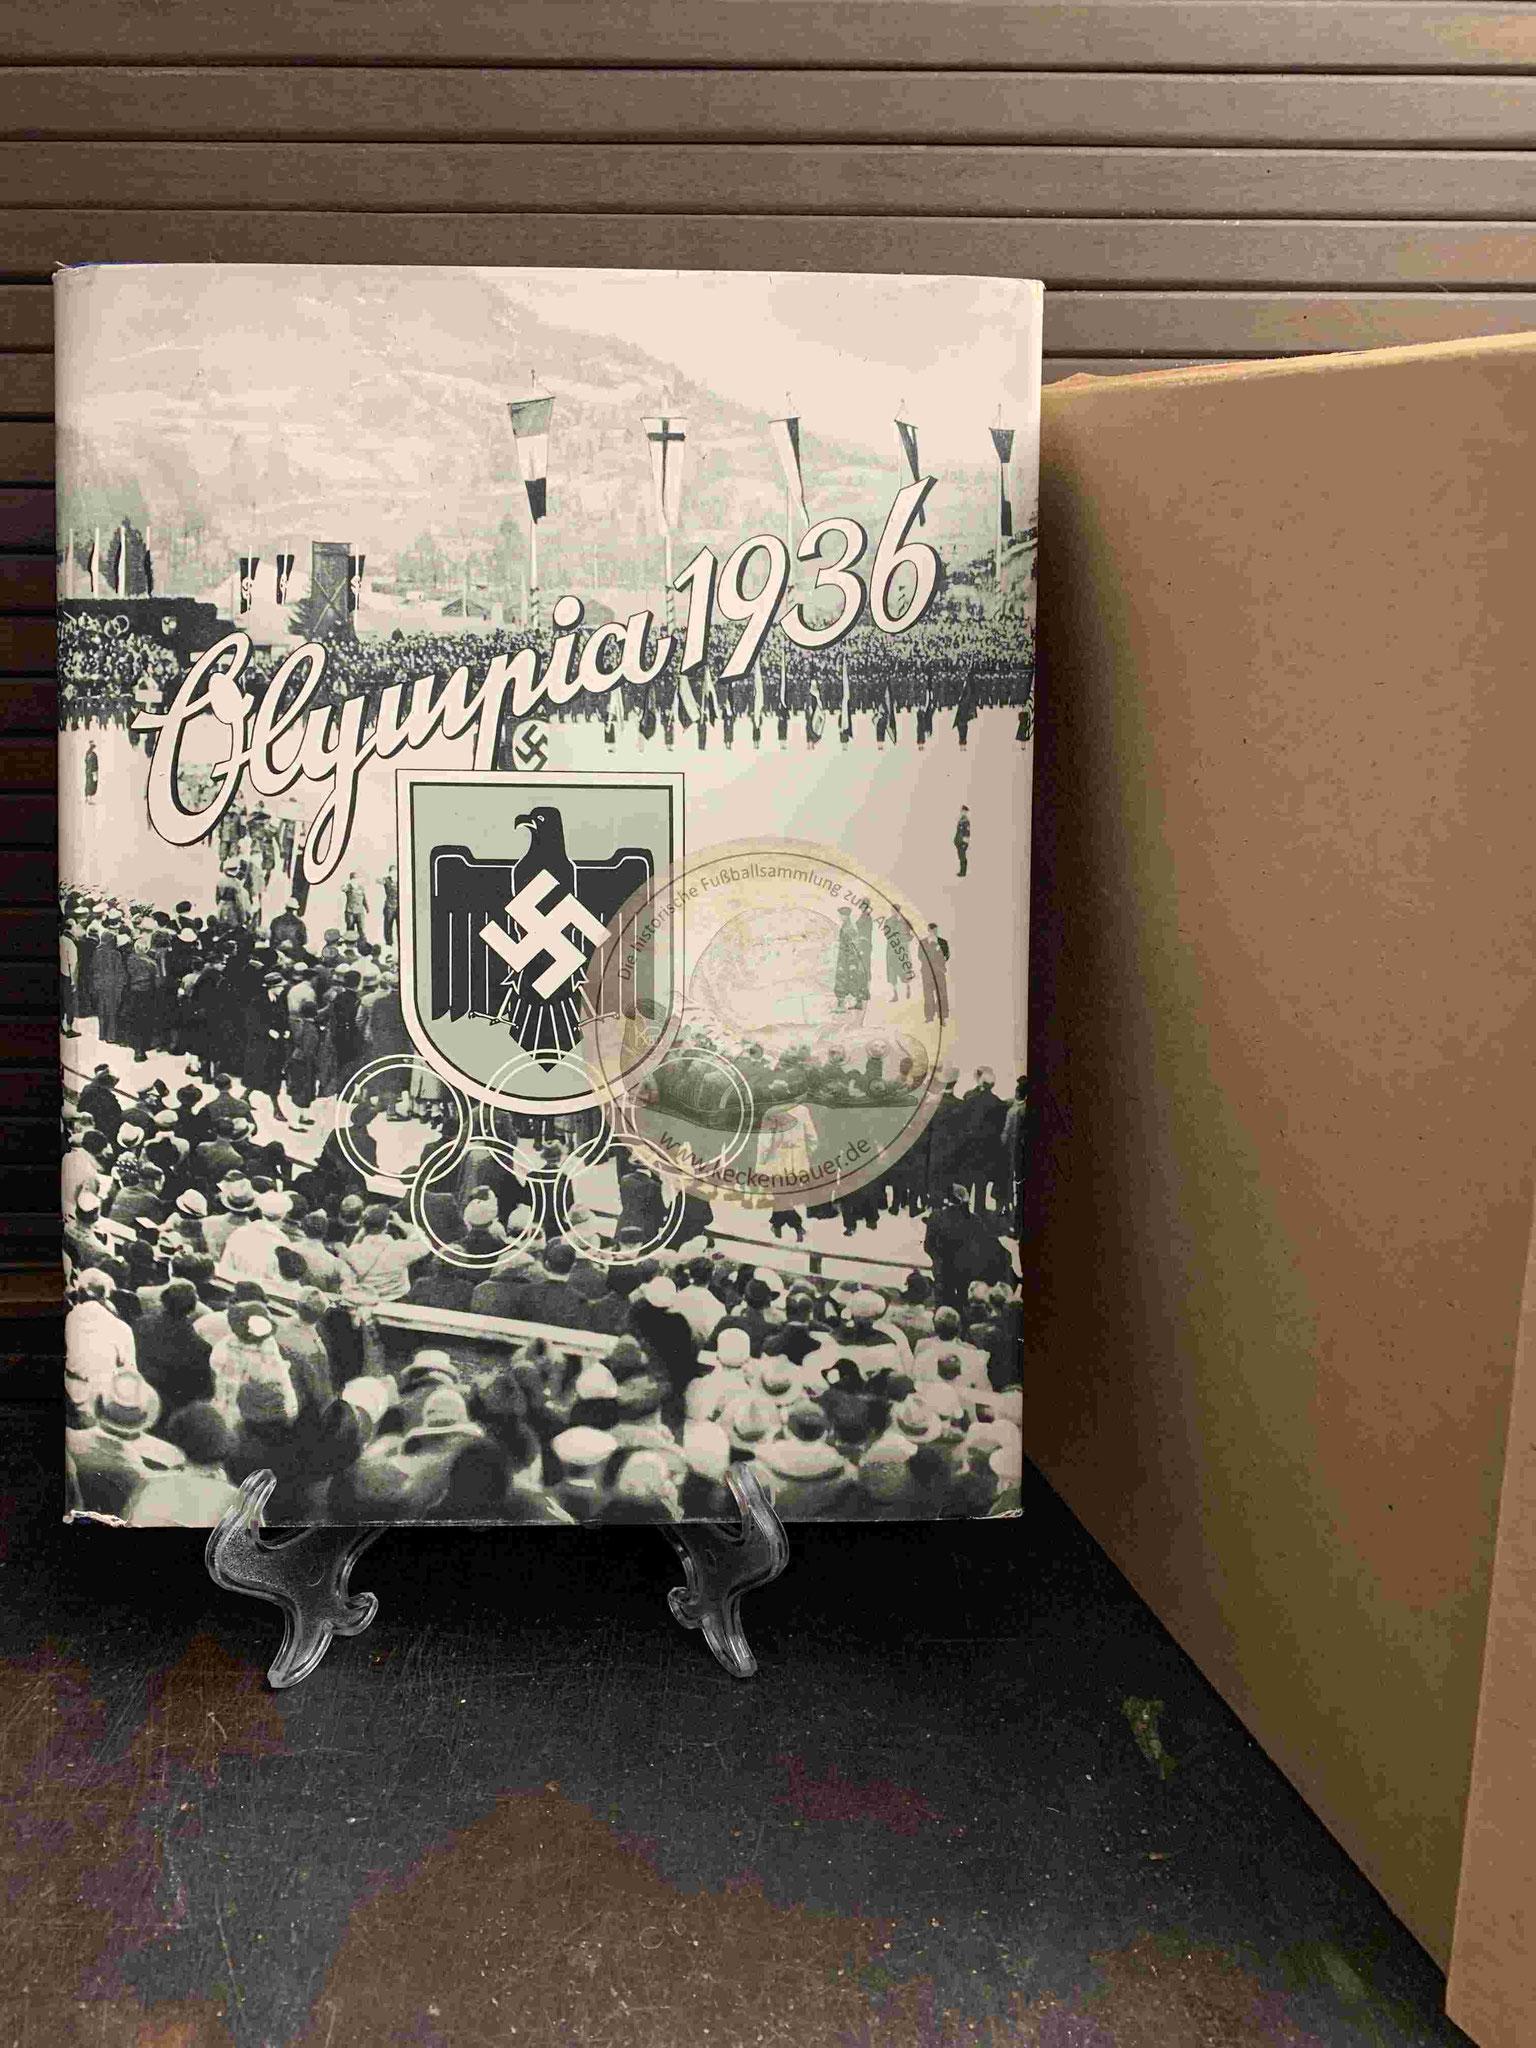 1936 Olympia 1936 Band 1 im Schober